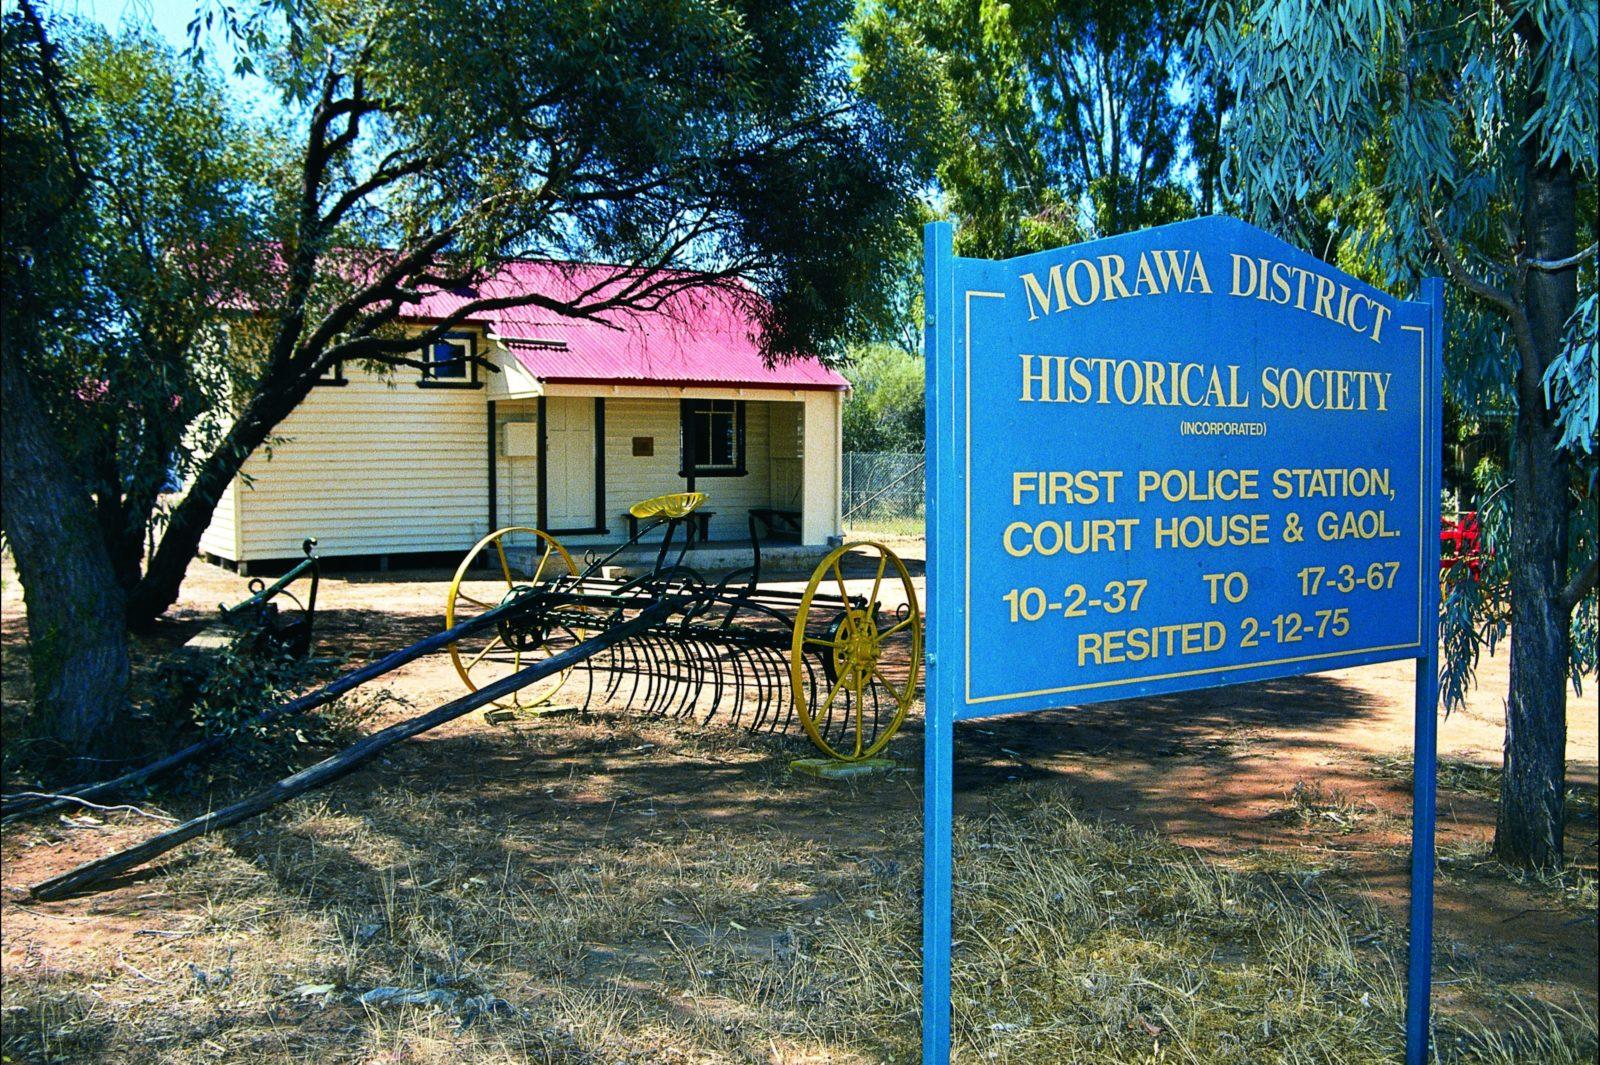 Morawa, Western Australia